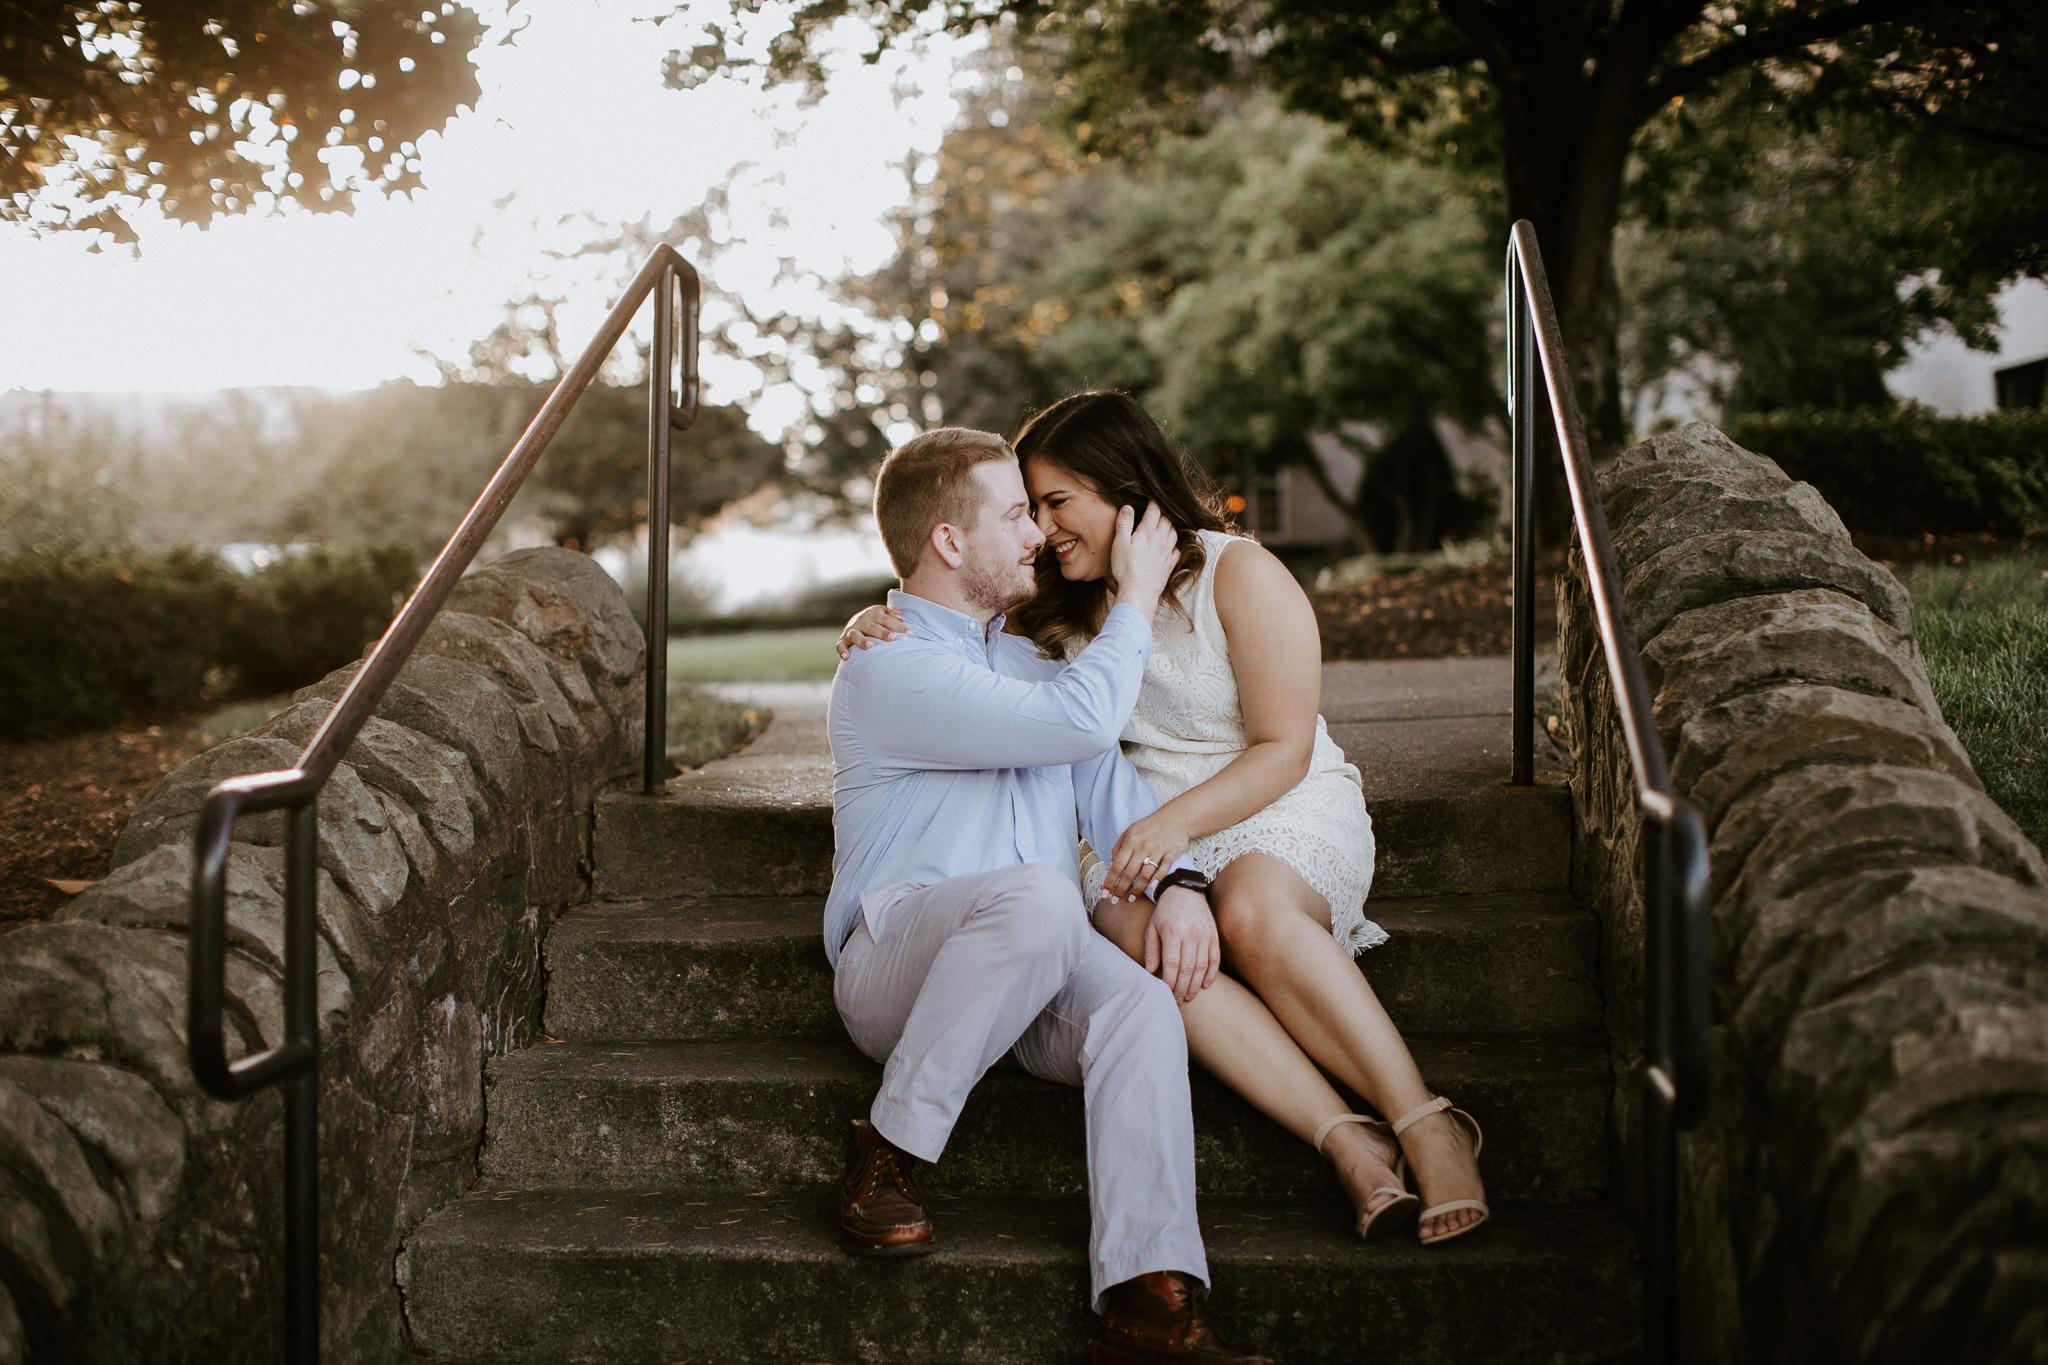 Engagement - Downtown Roanoke -  Wedding Photographer - Virginia - Best - Pat Cori Photography-17.jpg